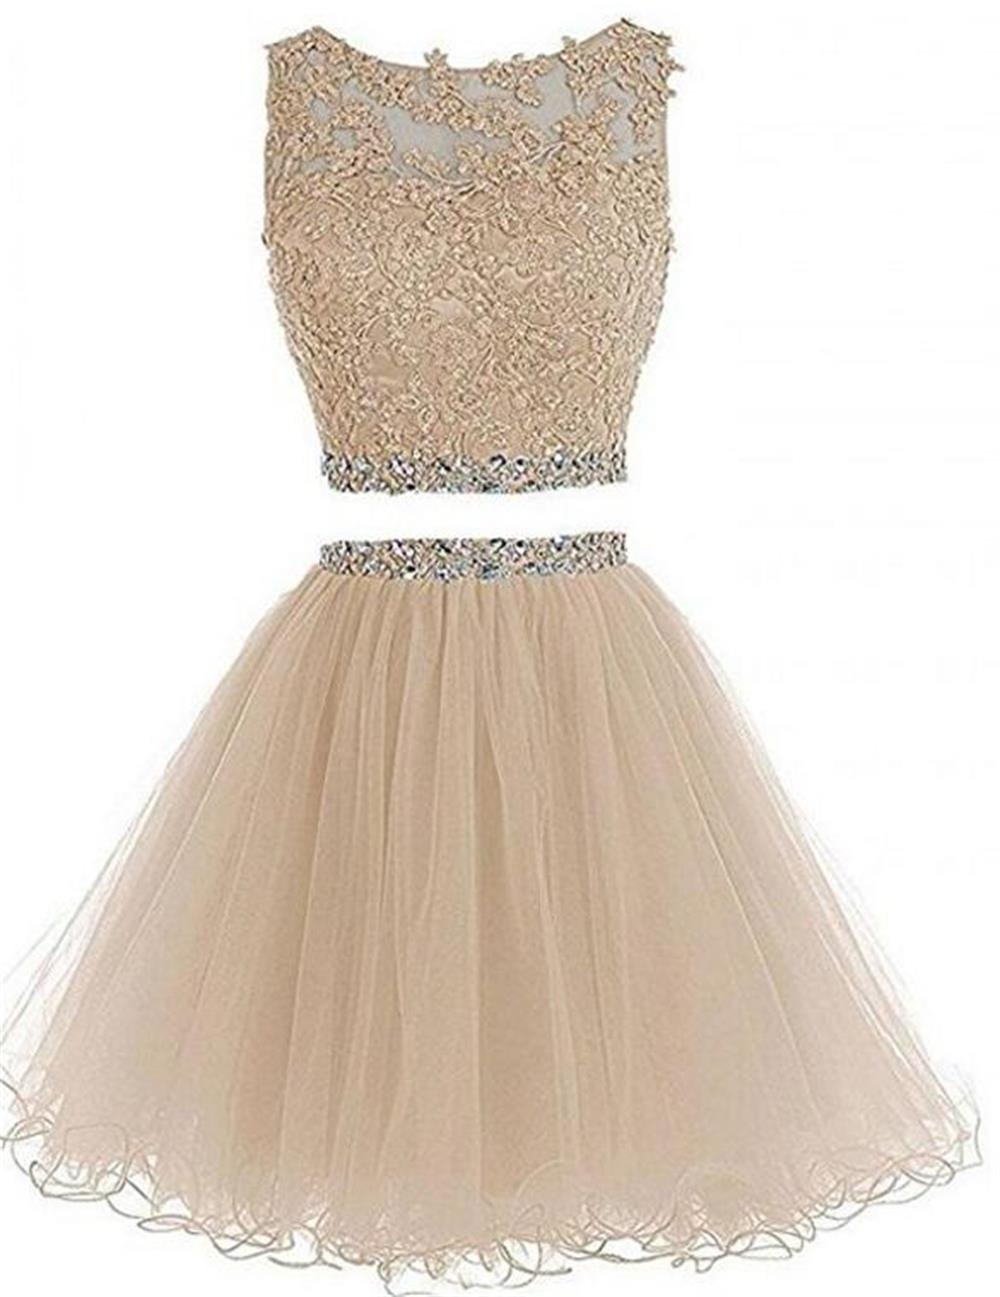 Dydsz Women's Prom Homecoming Dresses